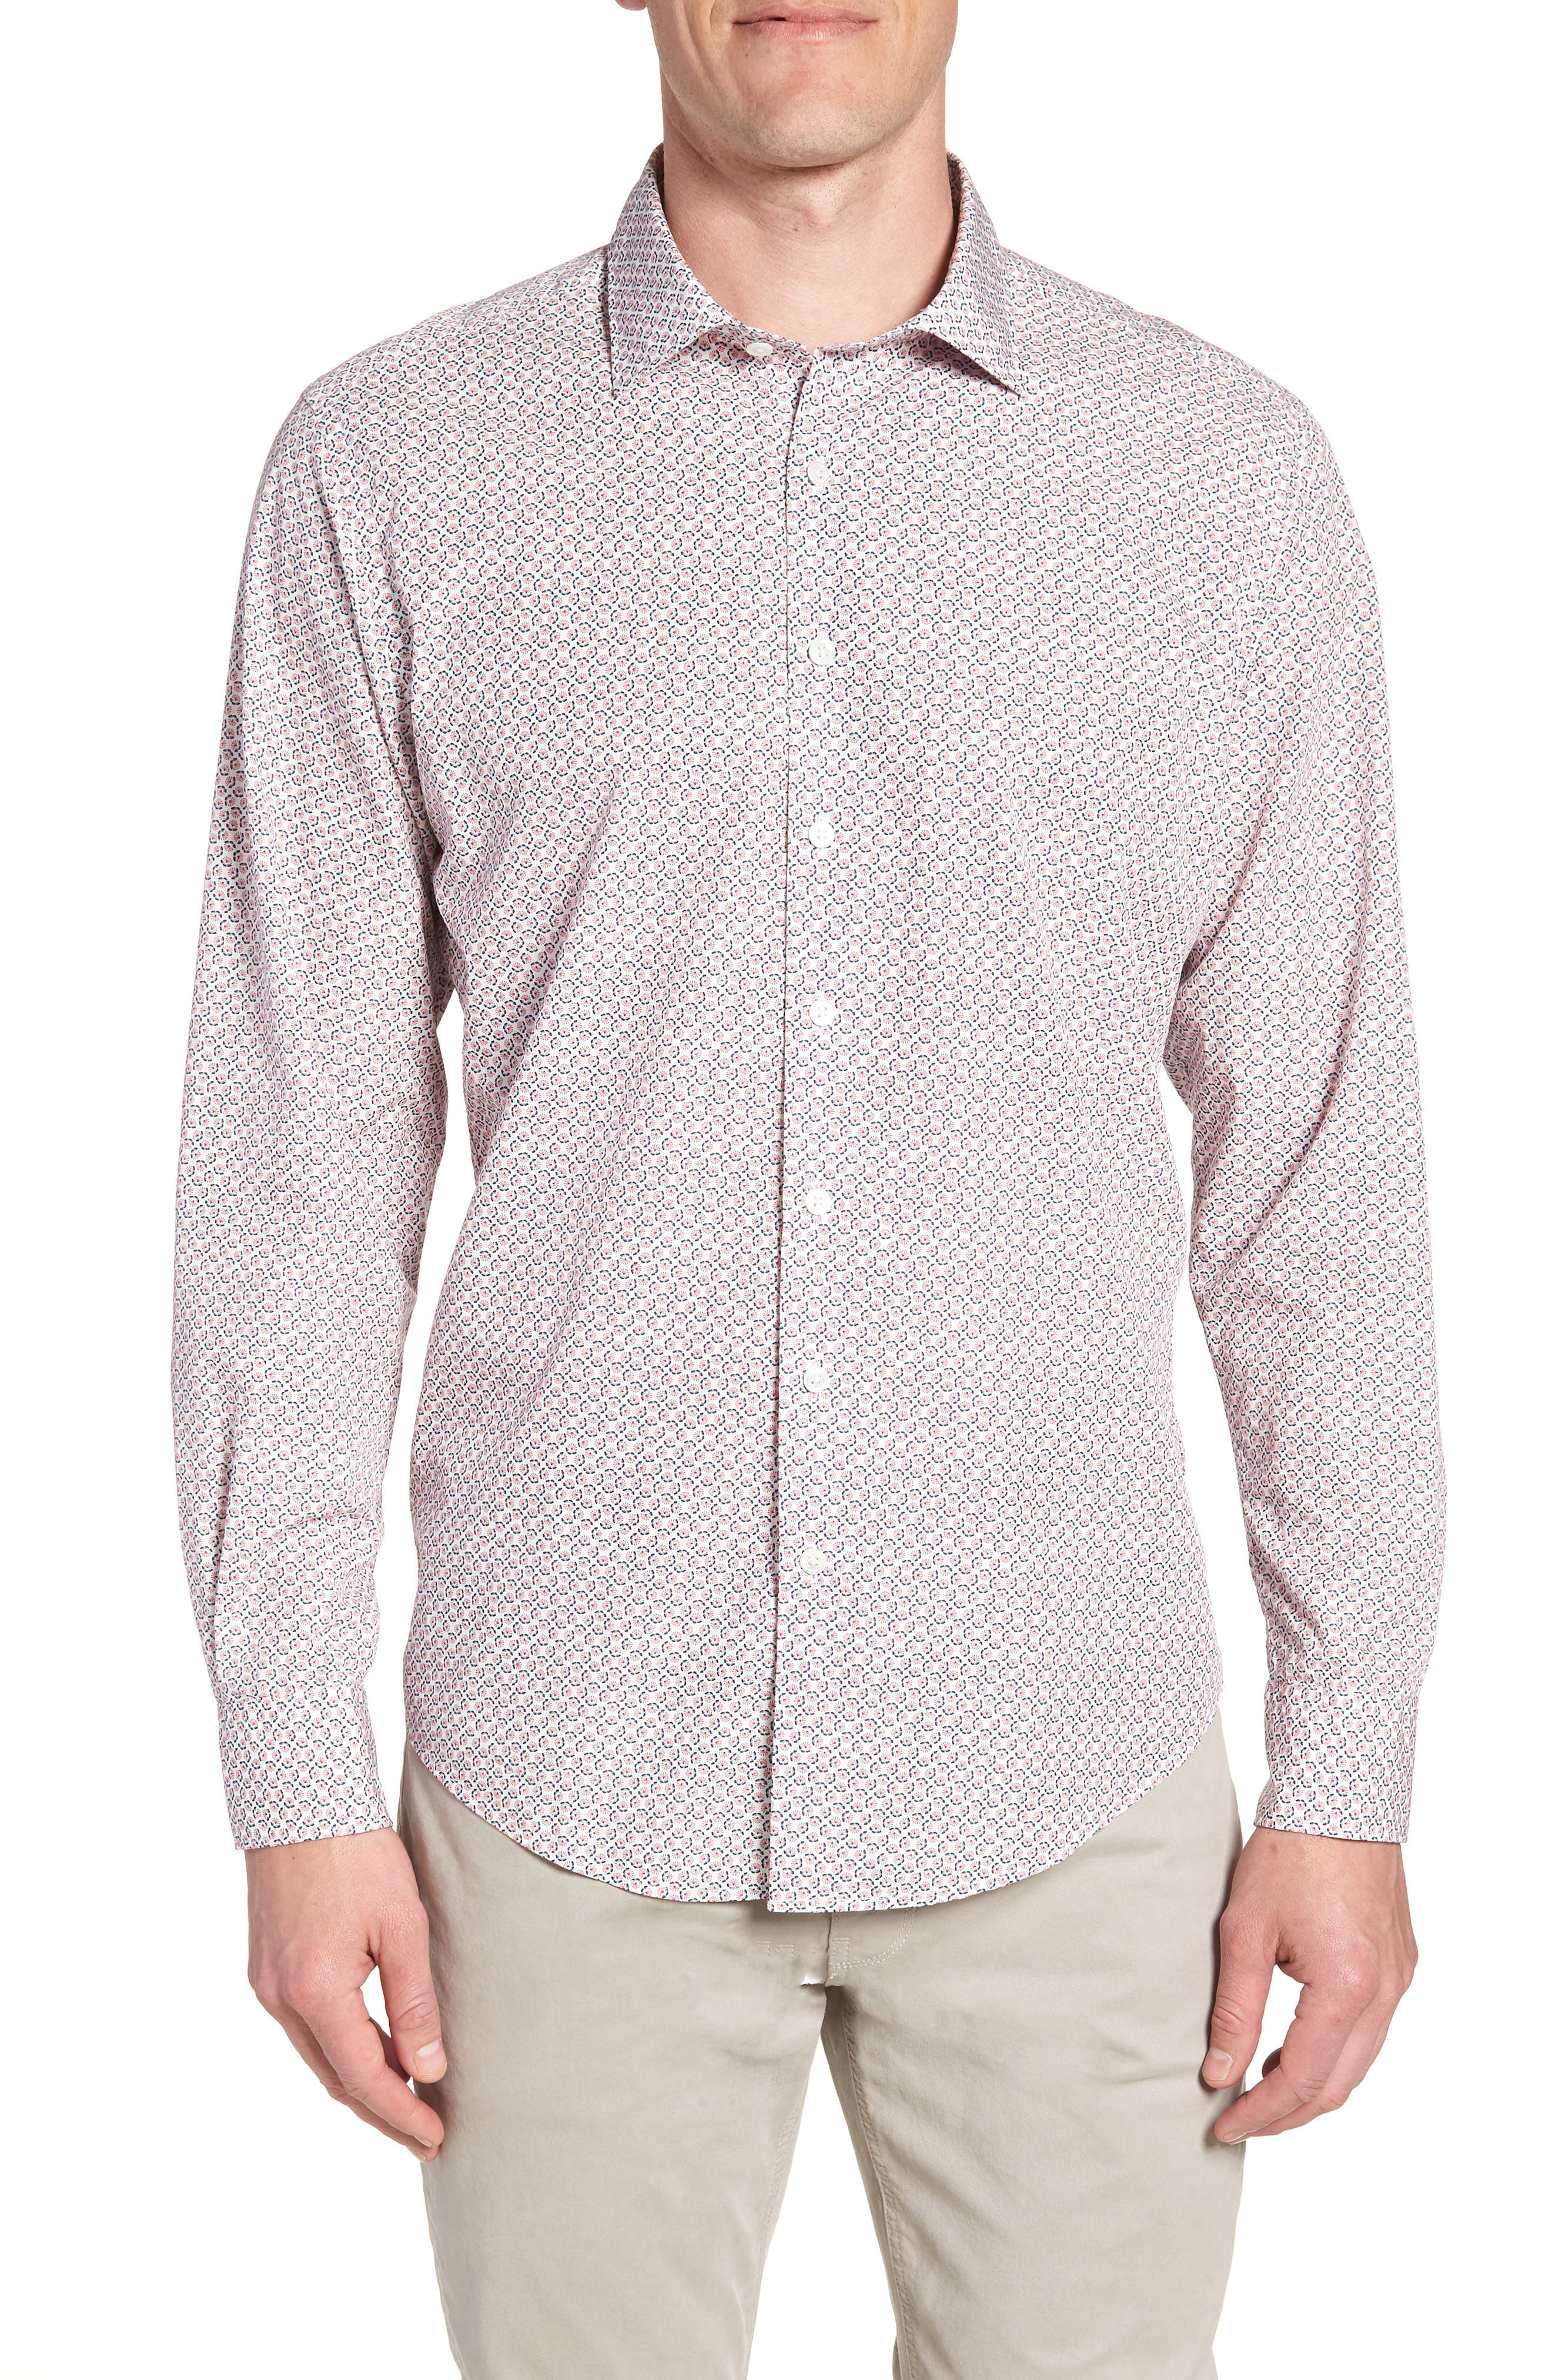 Market Cross Sport Shirt,                         Main,                         color, 640